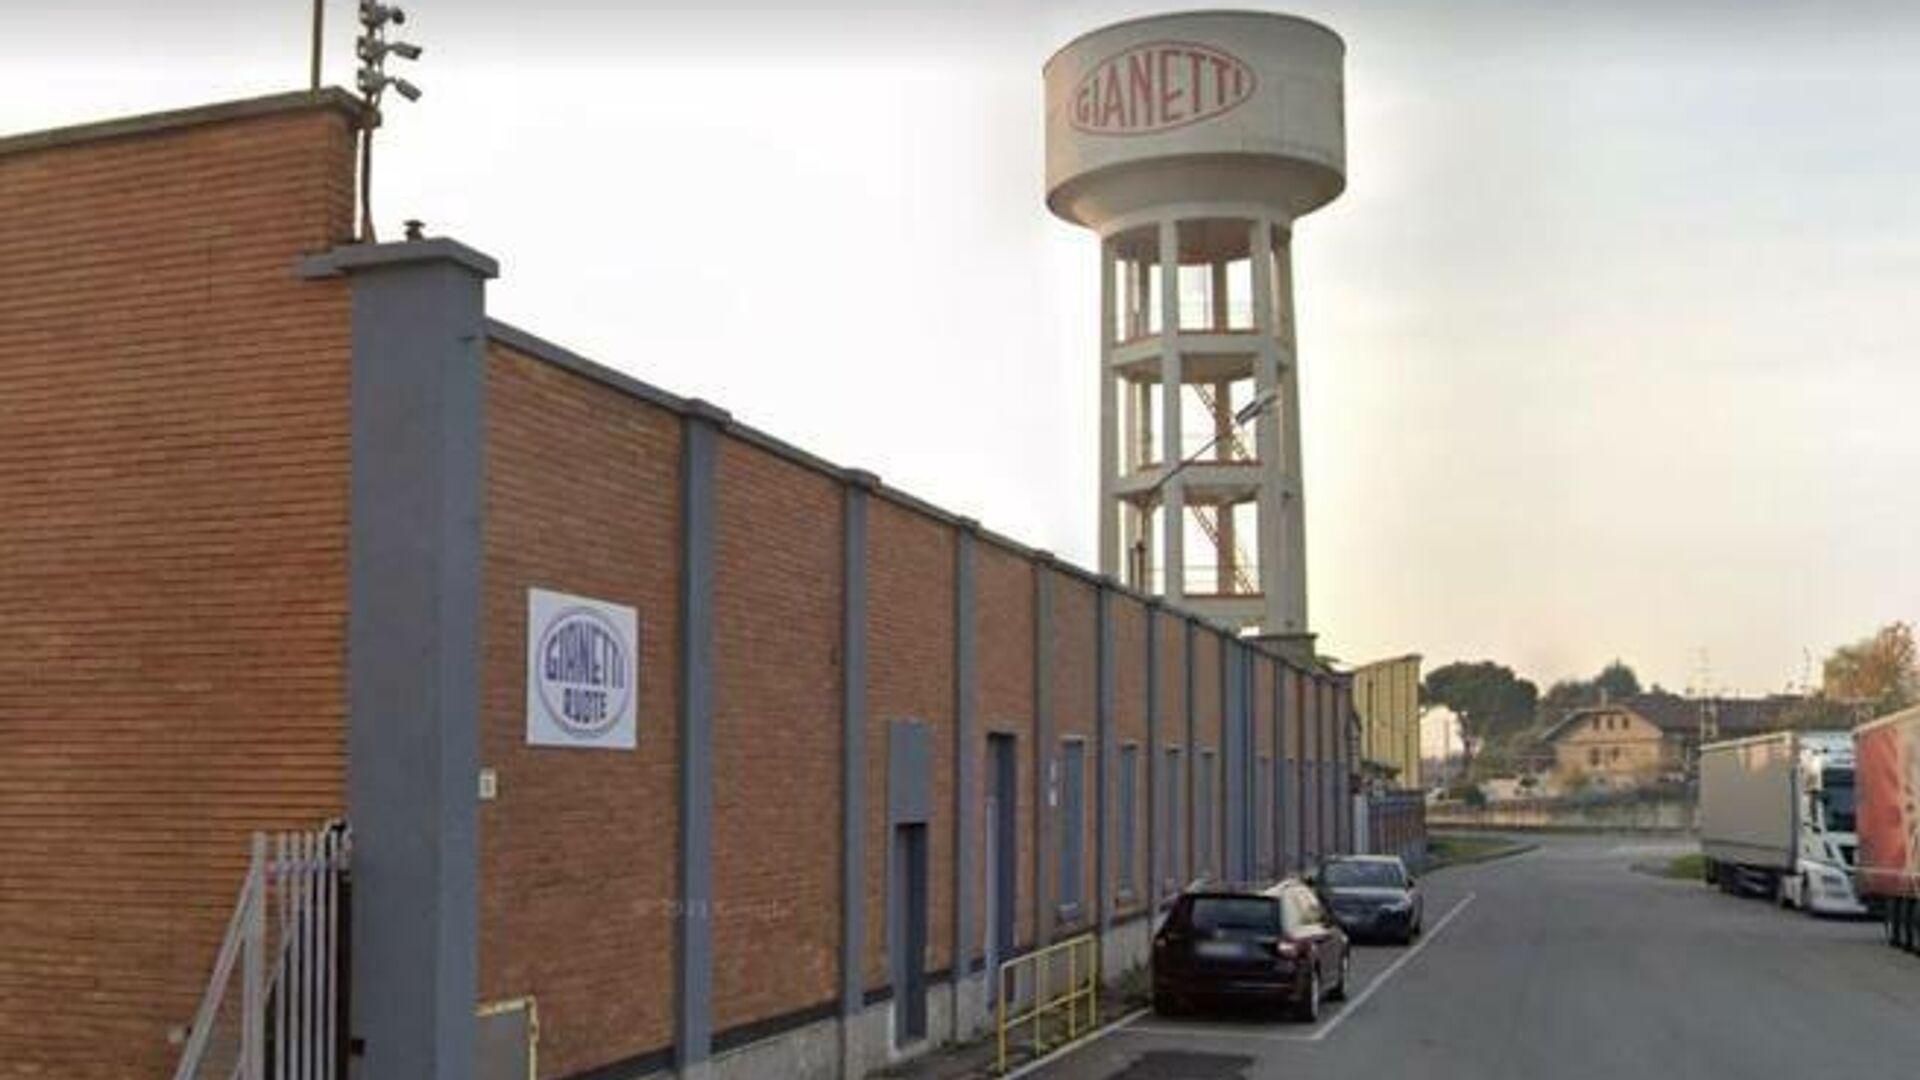 Stabilimento Gianetti Ruote - Sputnik Italia, 1920, 15.08.2021